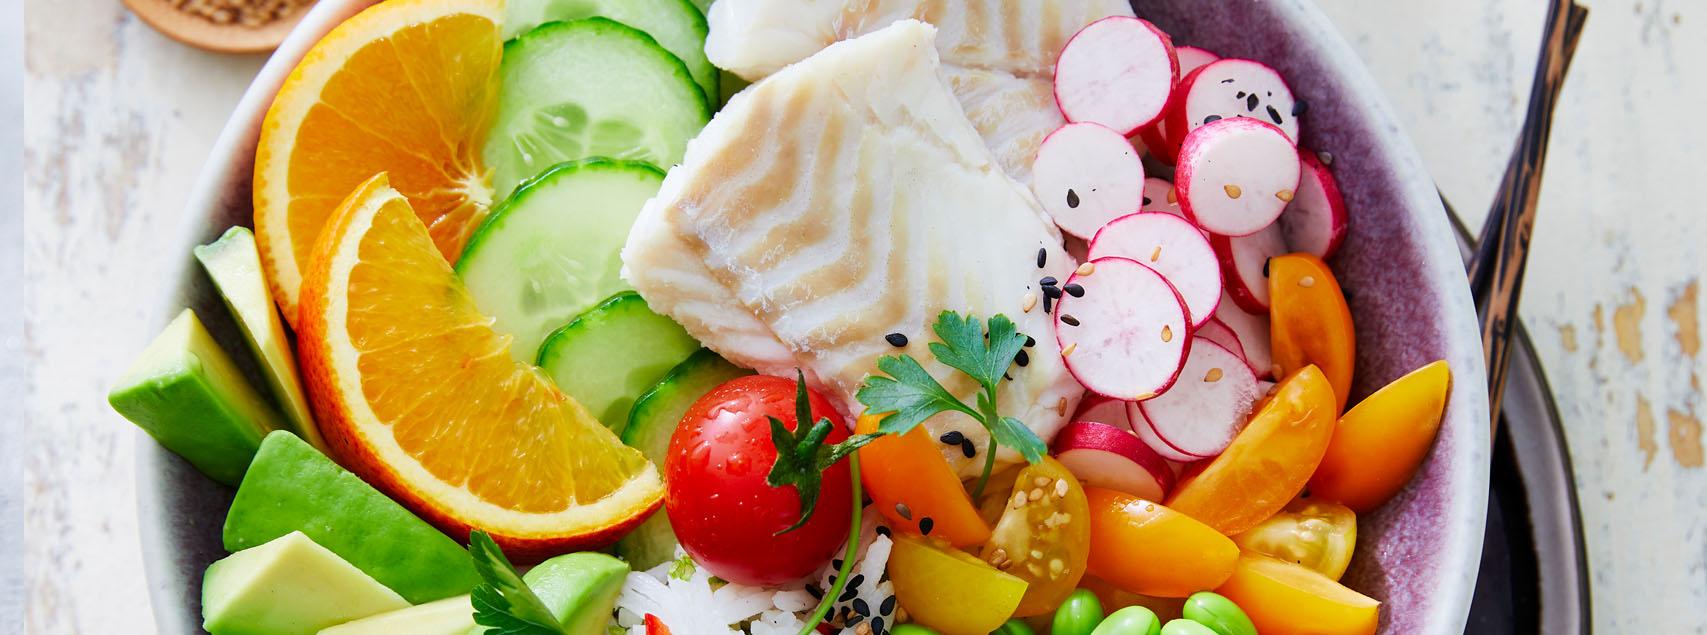 Bowl de cabillaud, riz et petits légumes